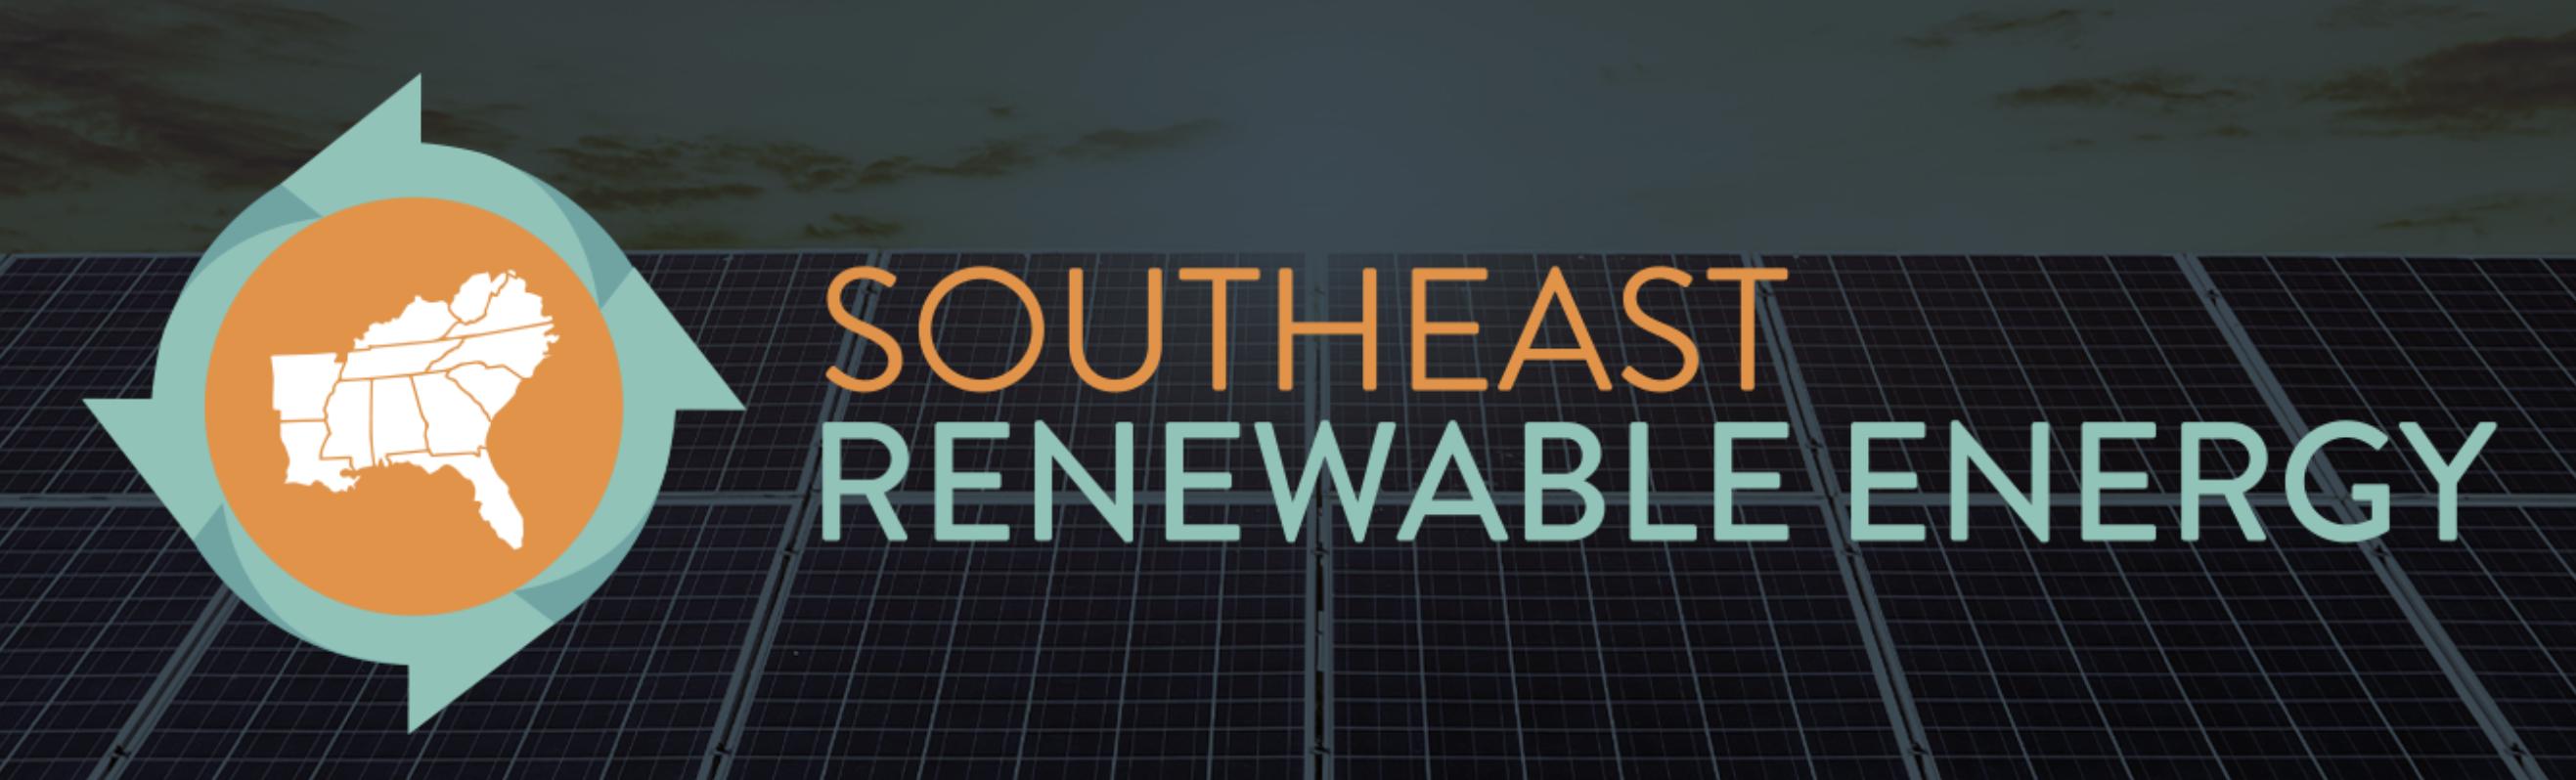 Southeast Renewable Energy Summit